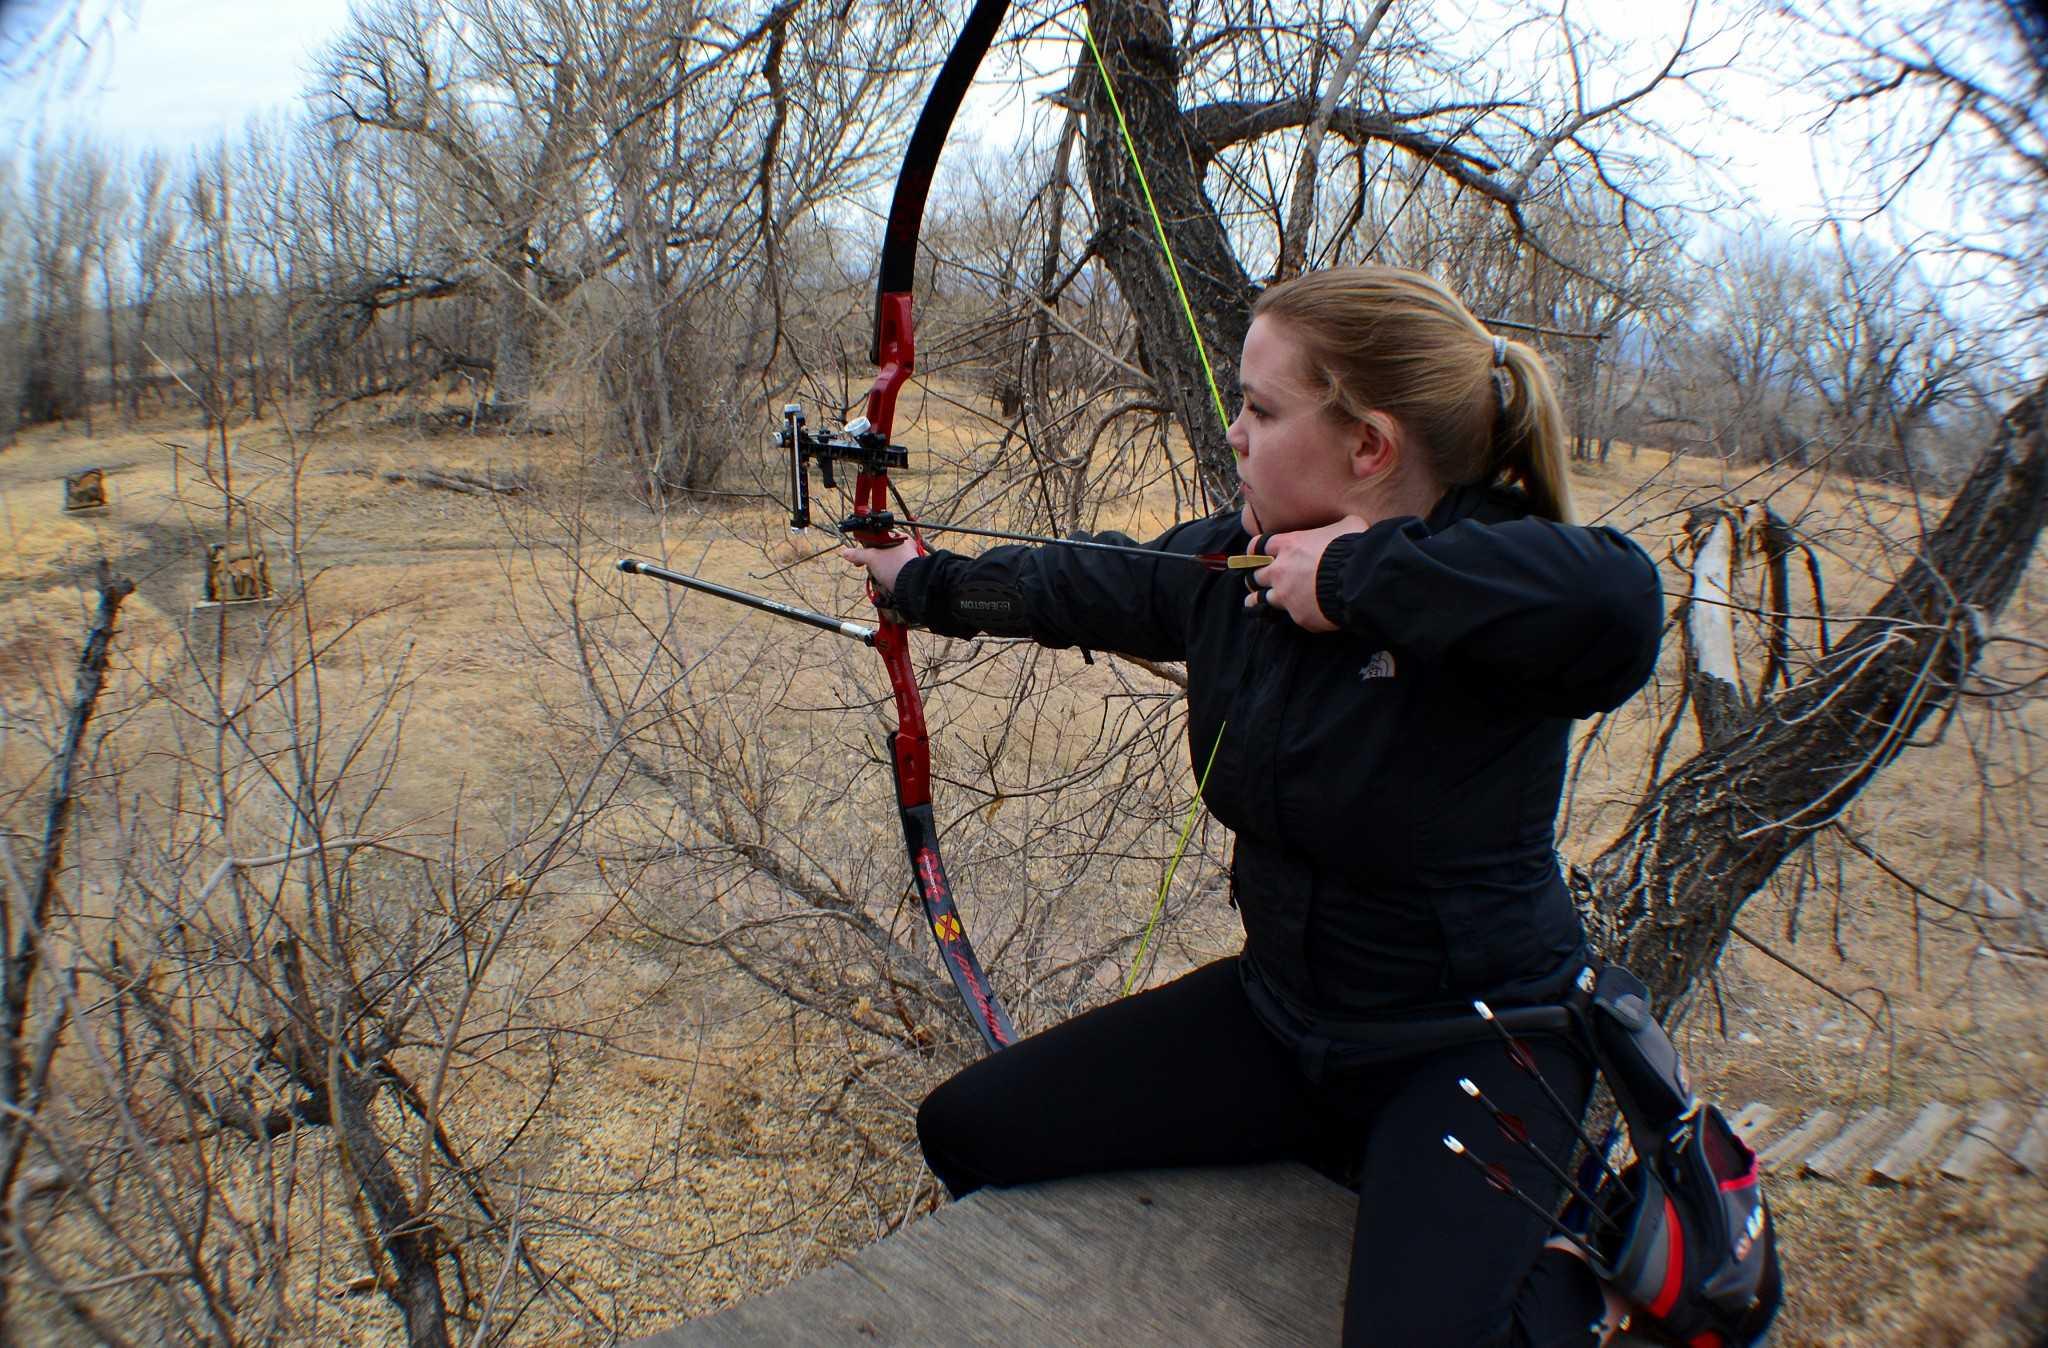 Archery Lessons San Diego